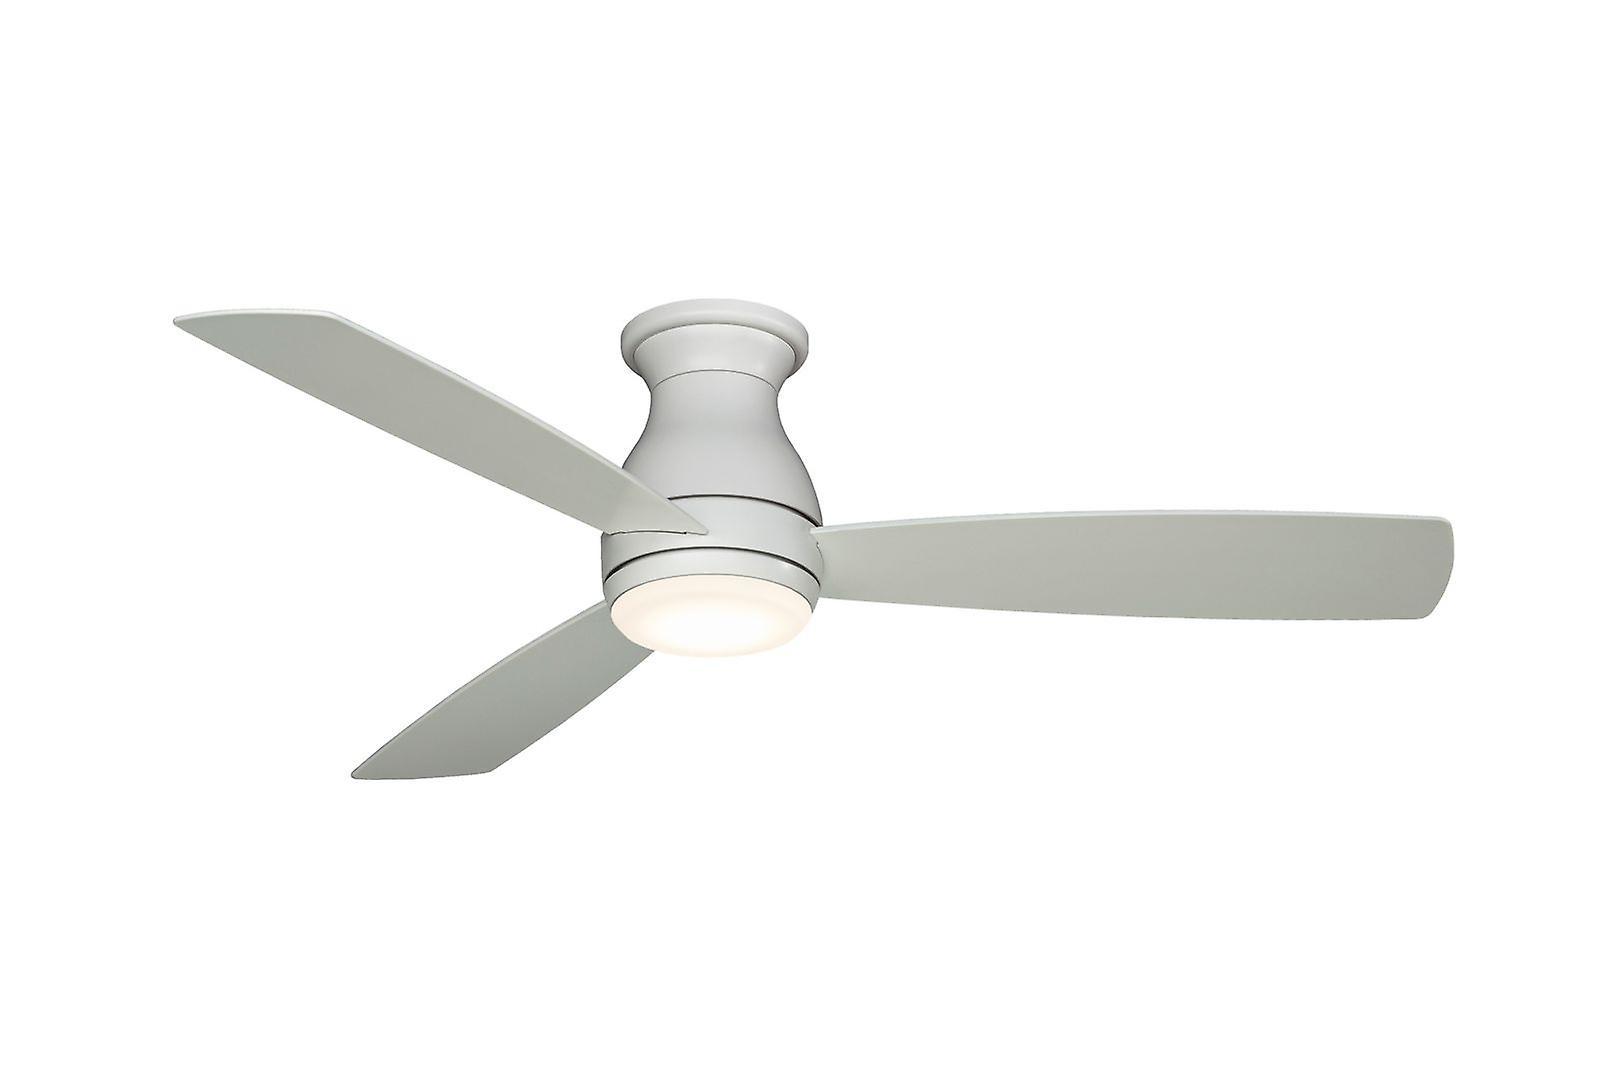 de plein air ceiling fan HUGH WET 112cm   44& 034; blanc with LED